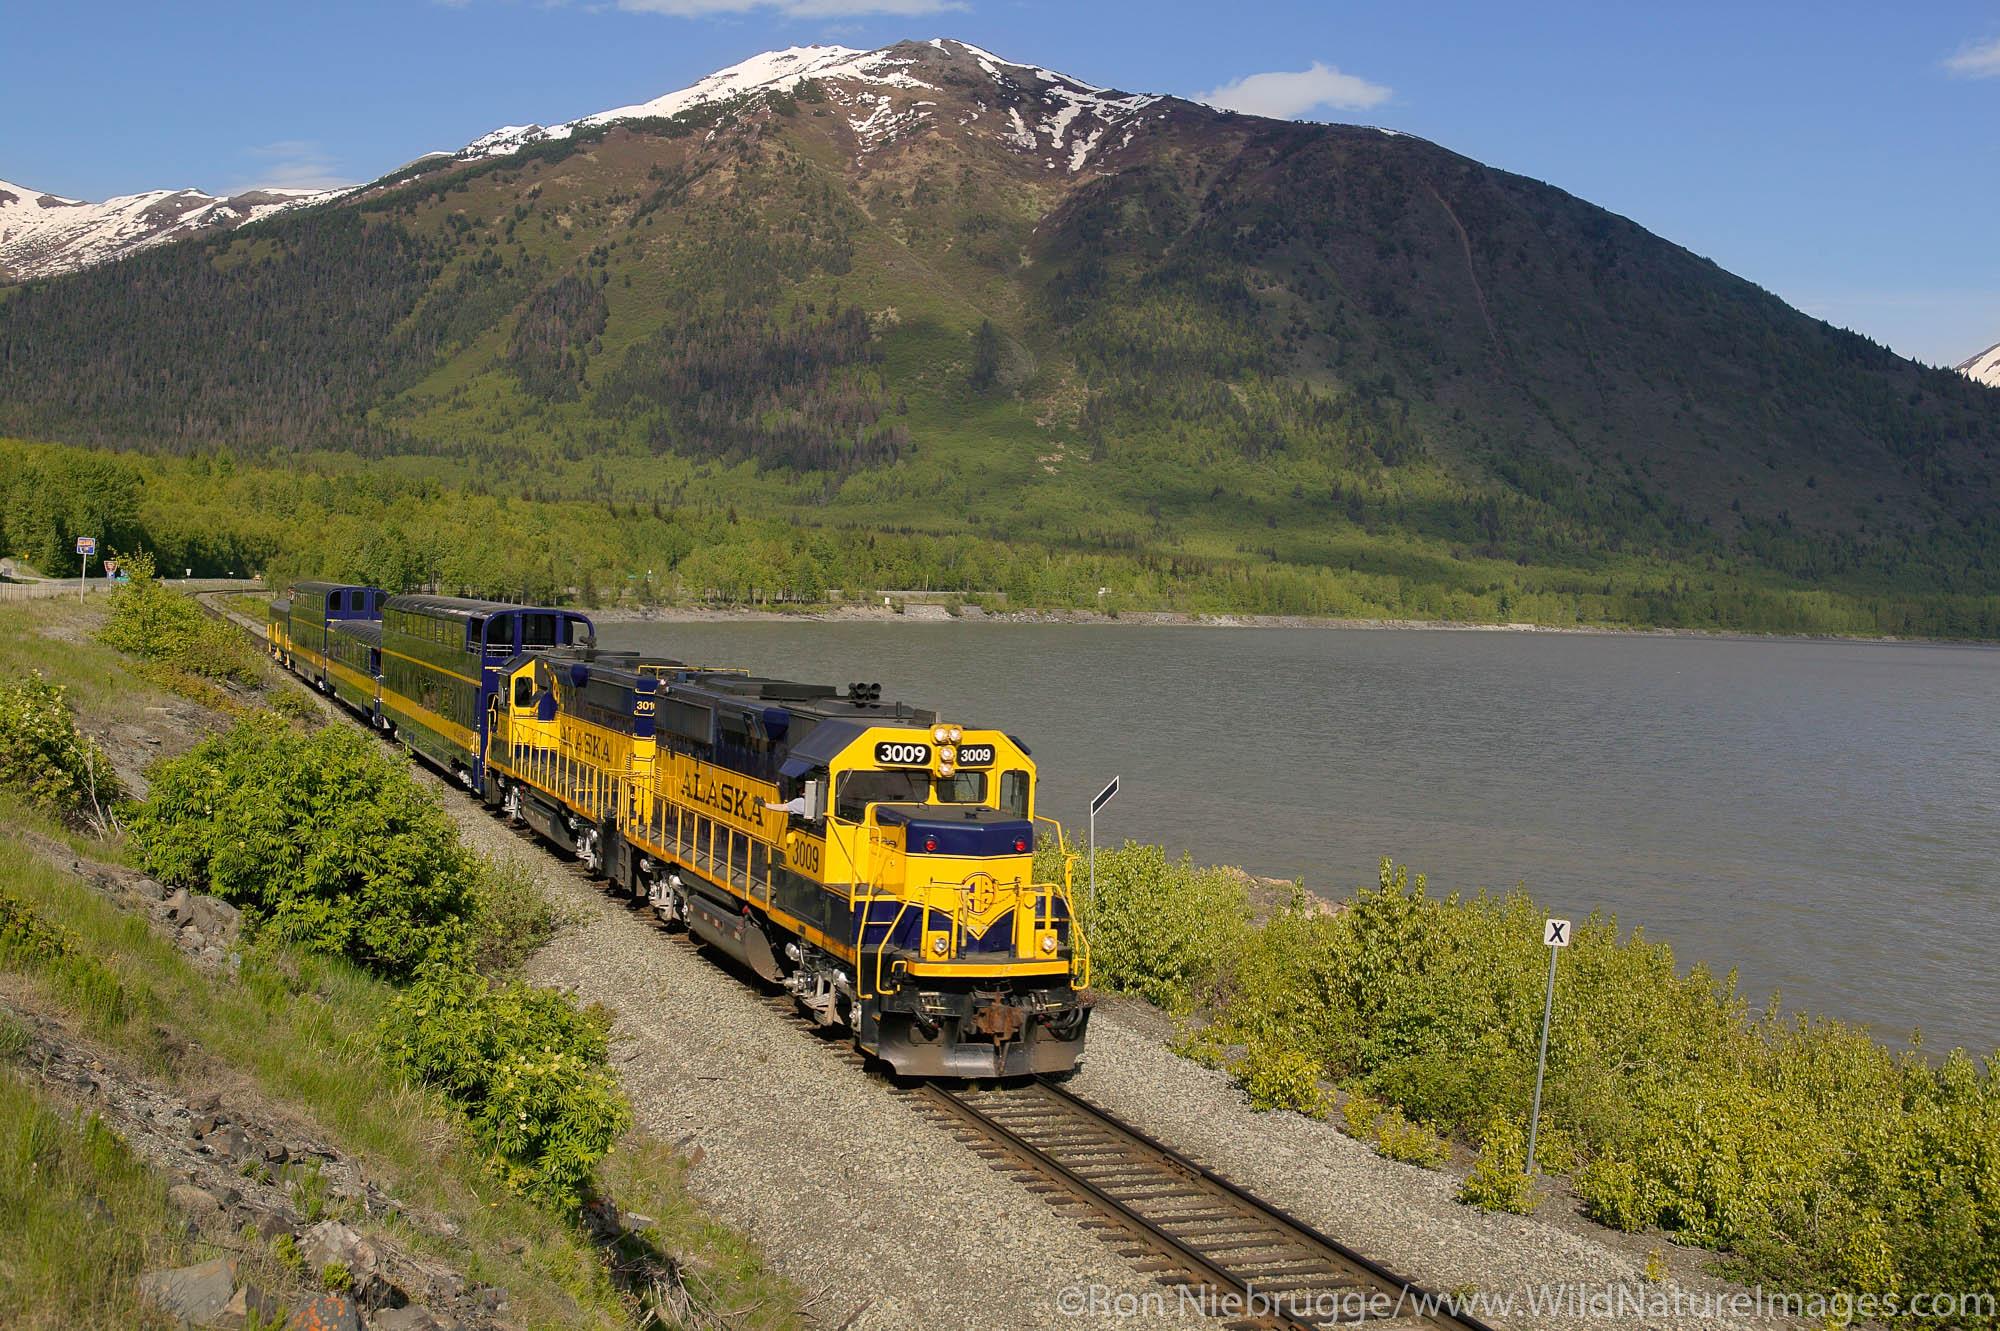 The first class passenger railcar on the Alaska Railroad, Anchorage, Alaska.